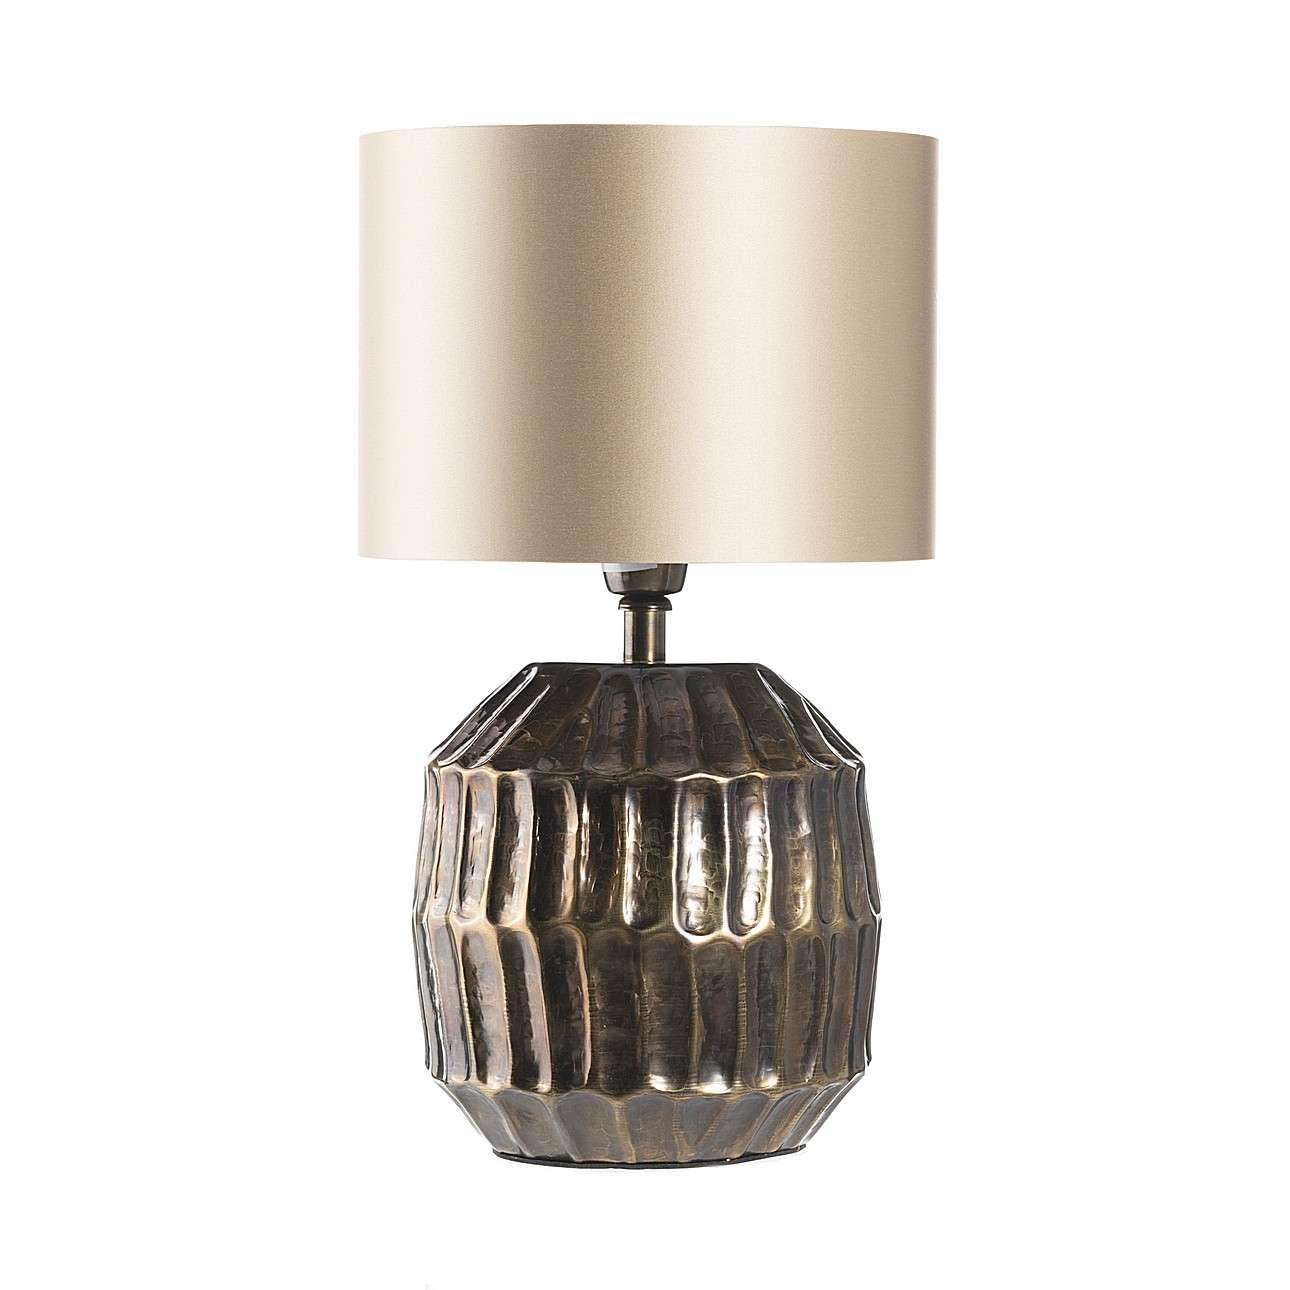 Lampa stołowa Muko 44 cm